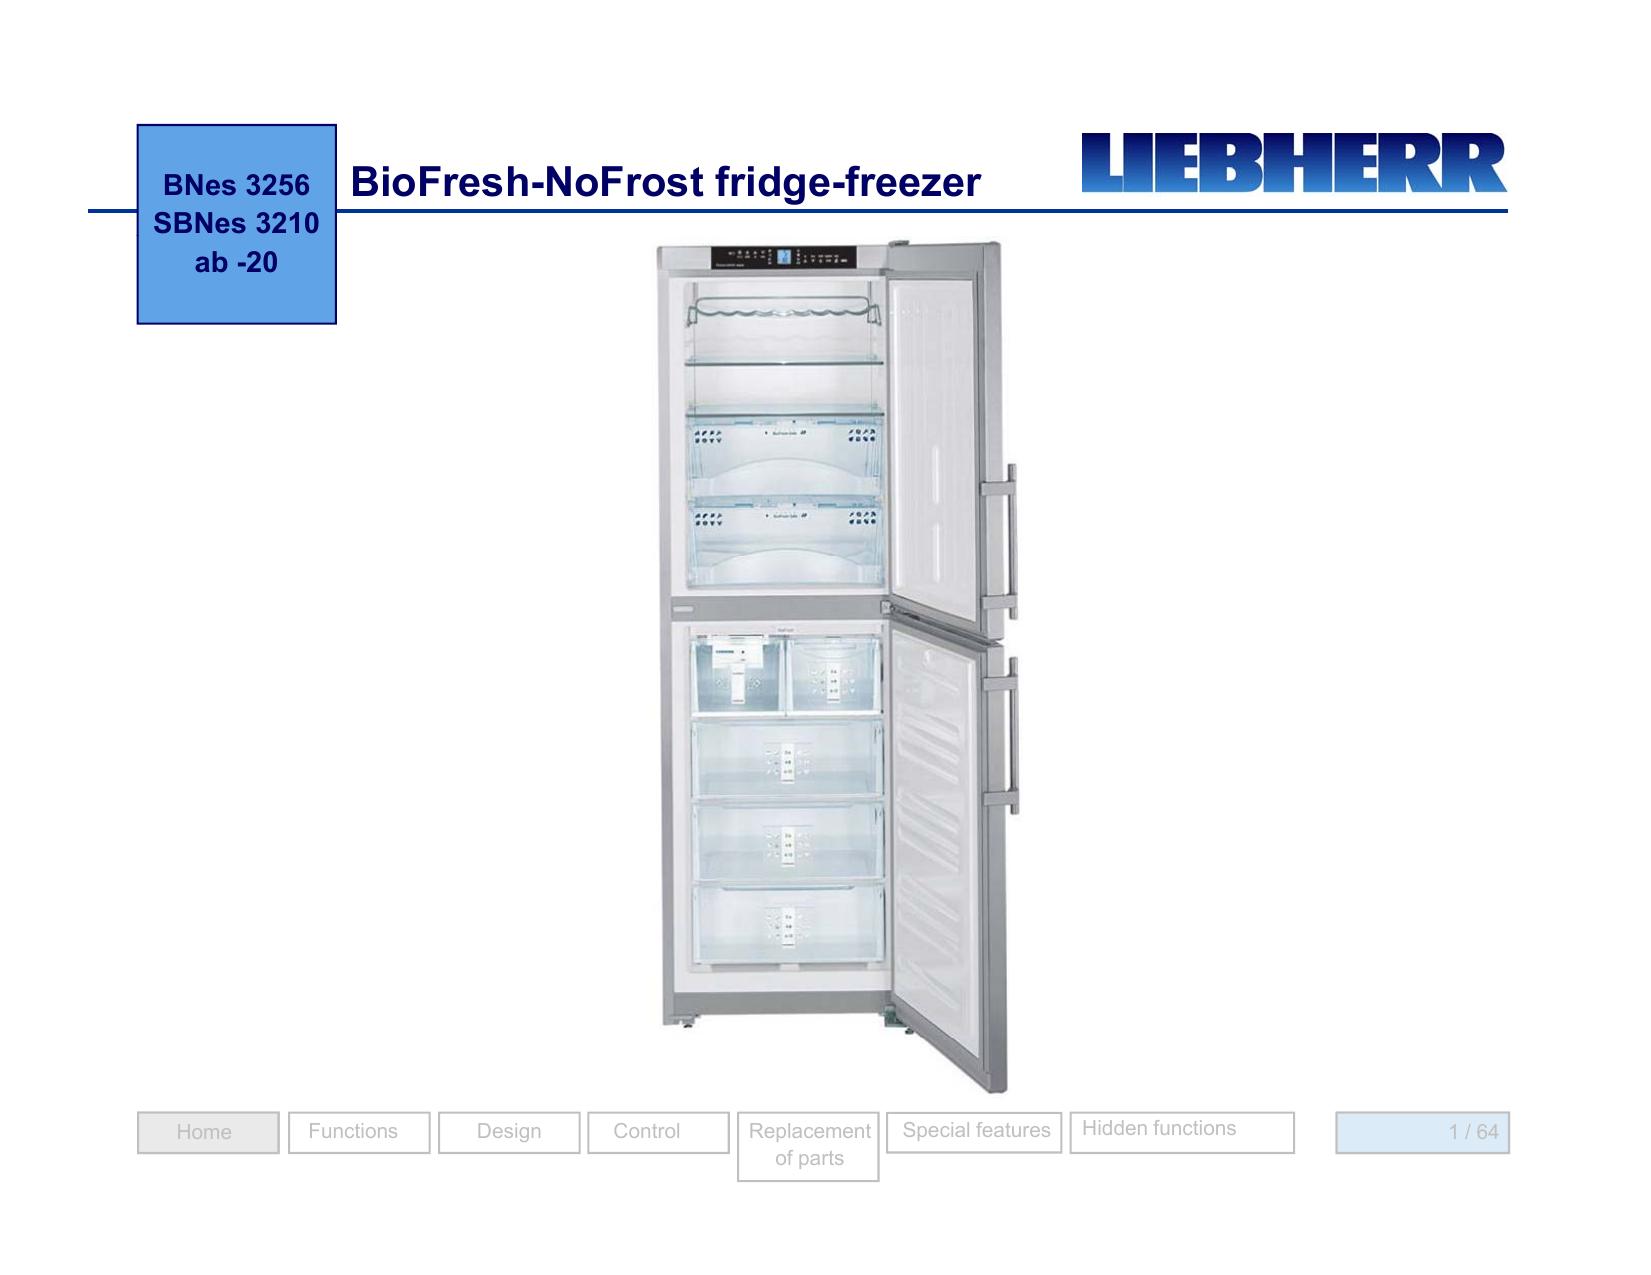 BioFresh-NoFrost fridge-freezer - Andi-Co | manualzz com